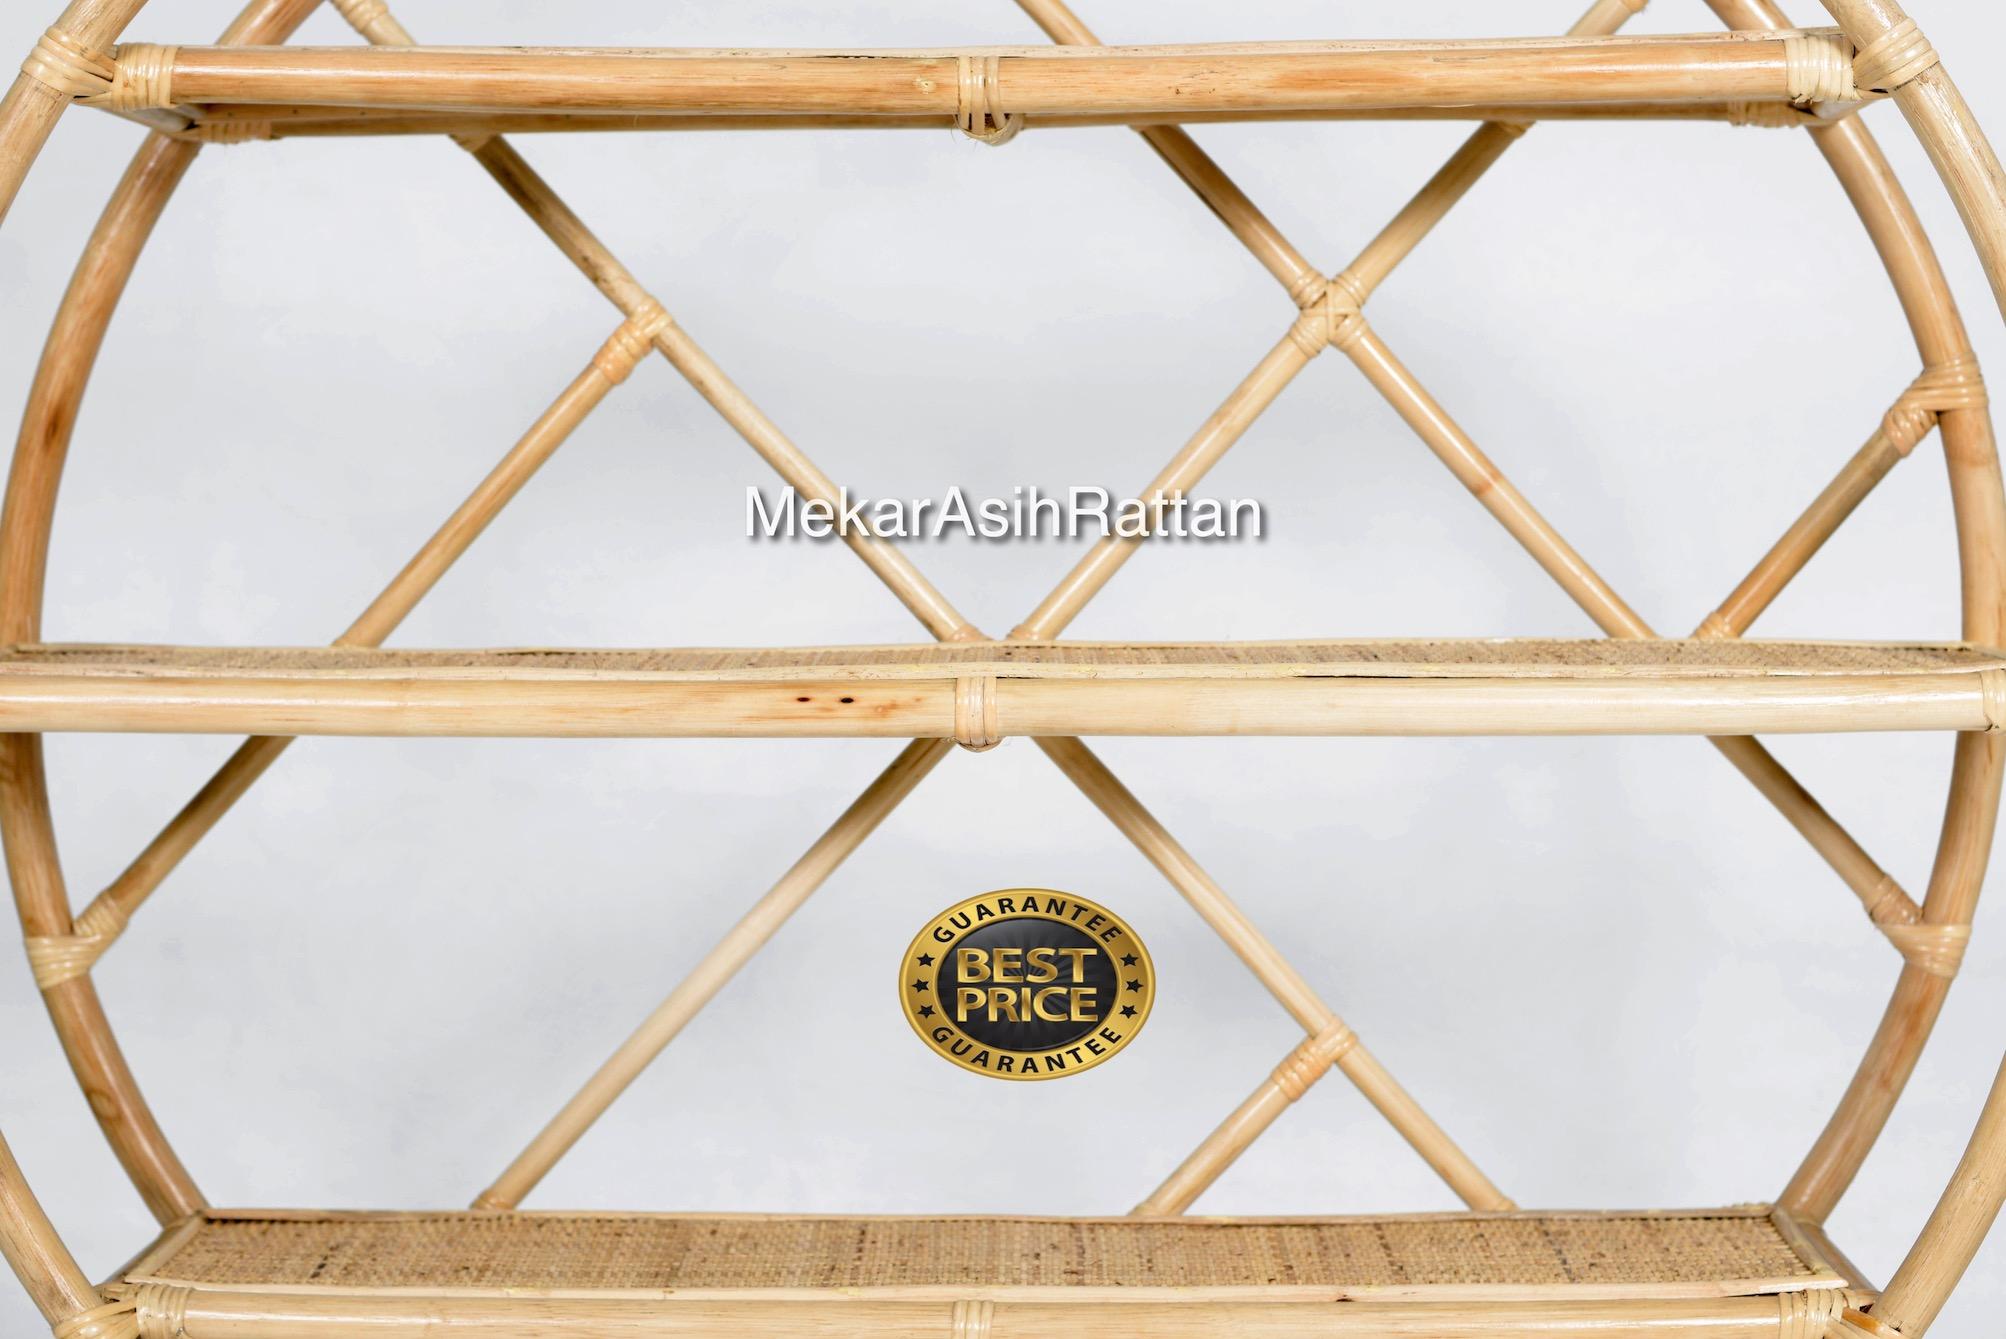 Indonesia natural Rattan home decoration rack book and libro de rak living room